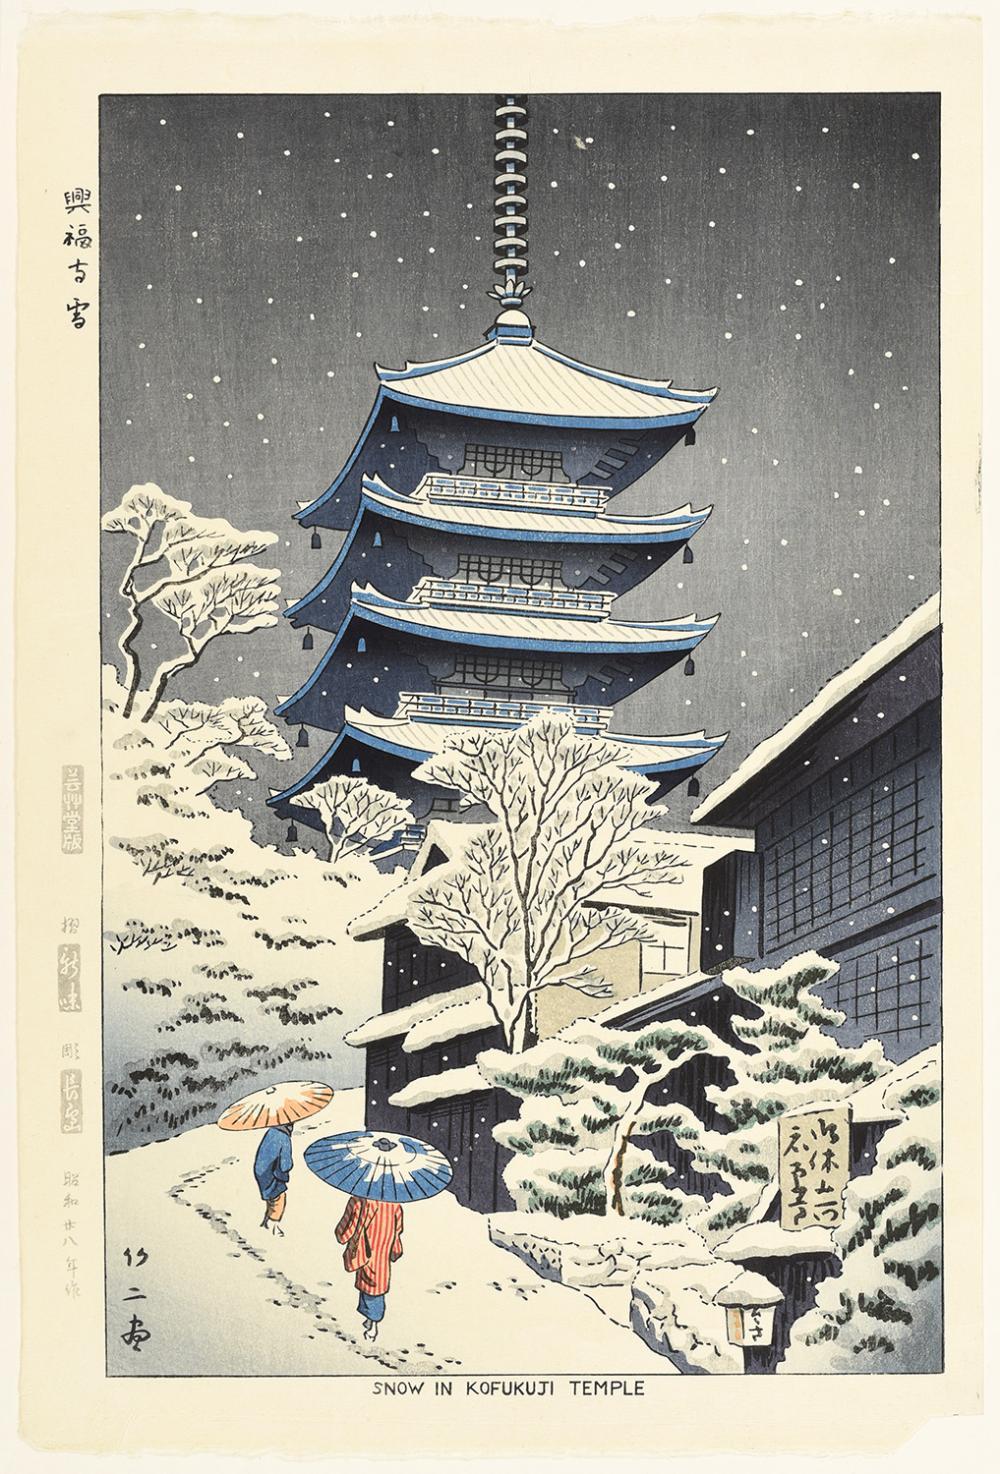 Takeji Asano (Japanese, b. 1900), Snow at Kofukuji Temple, woodblock print on paper